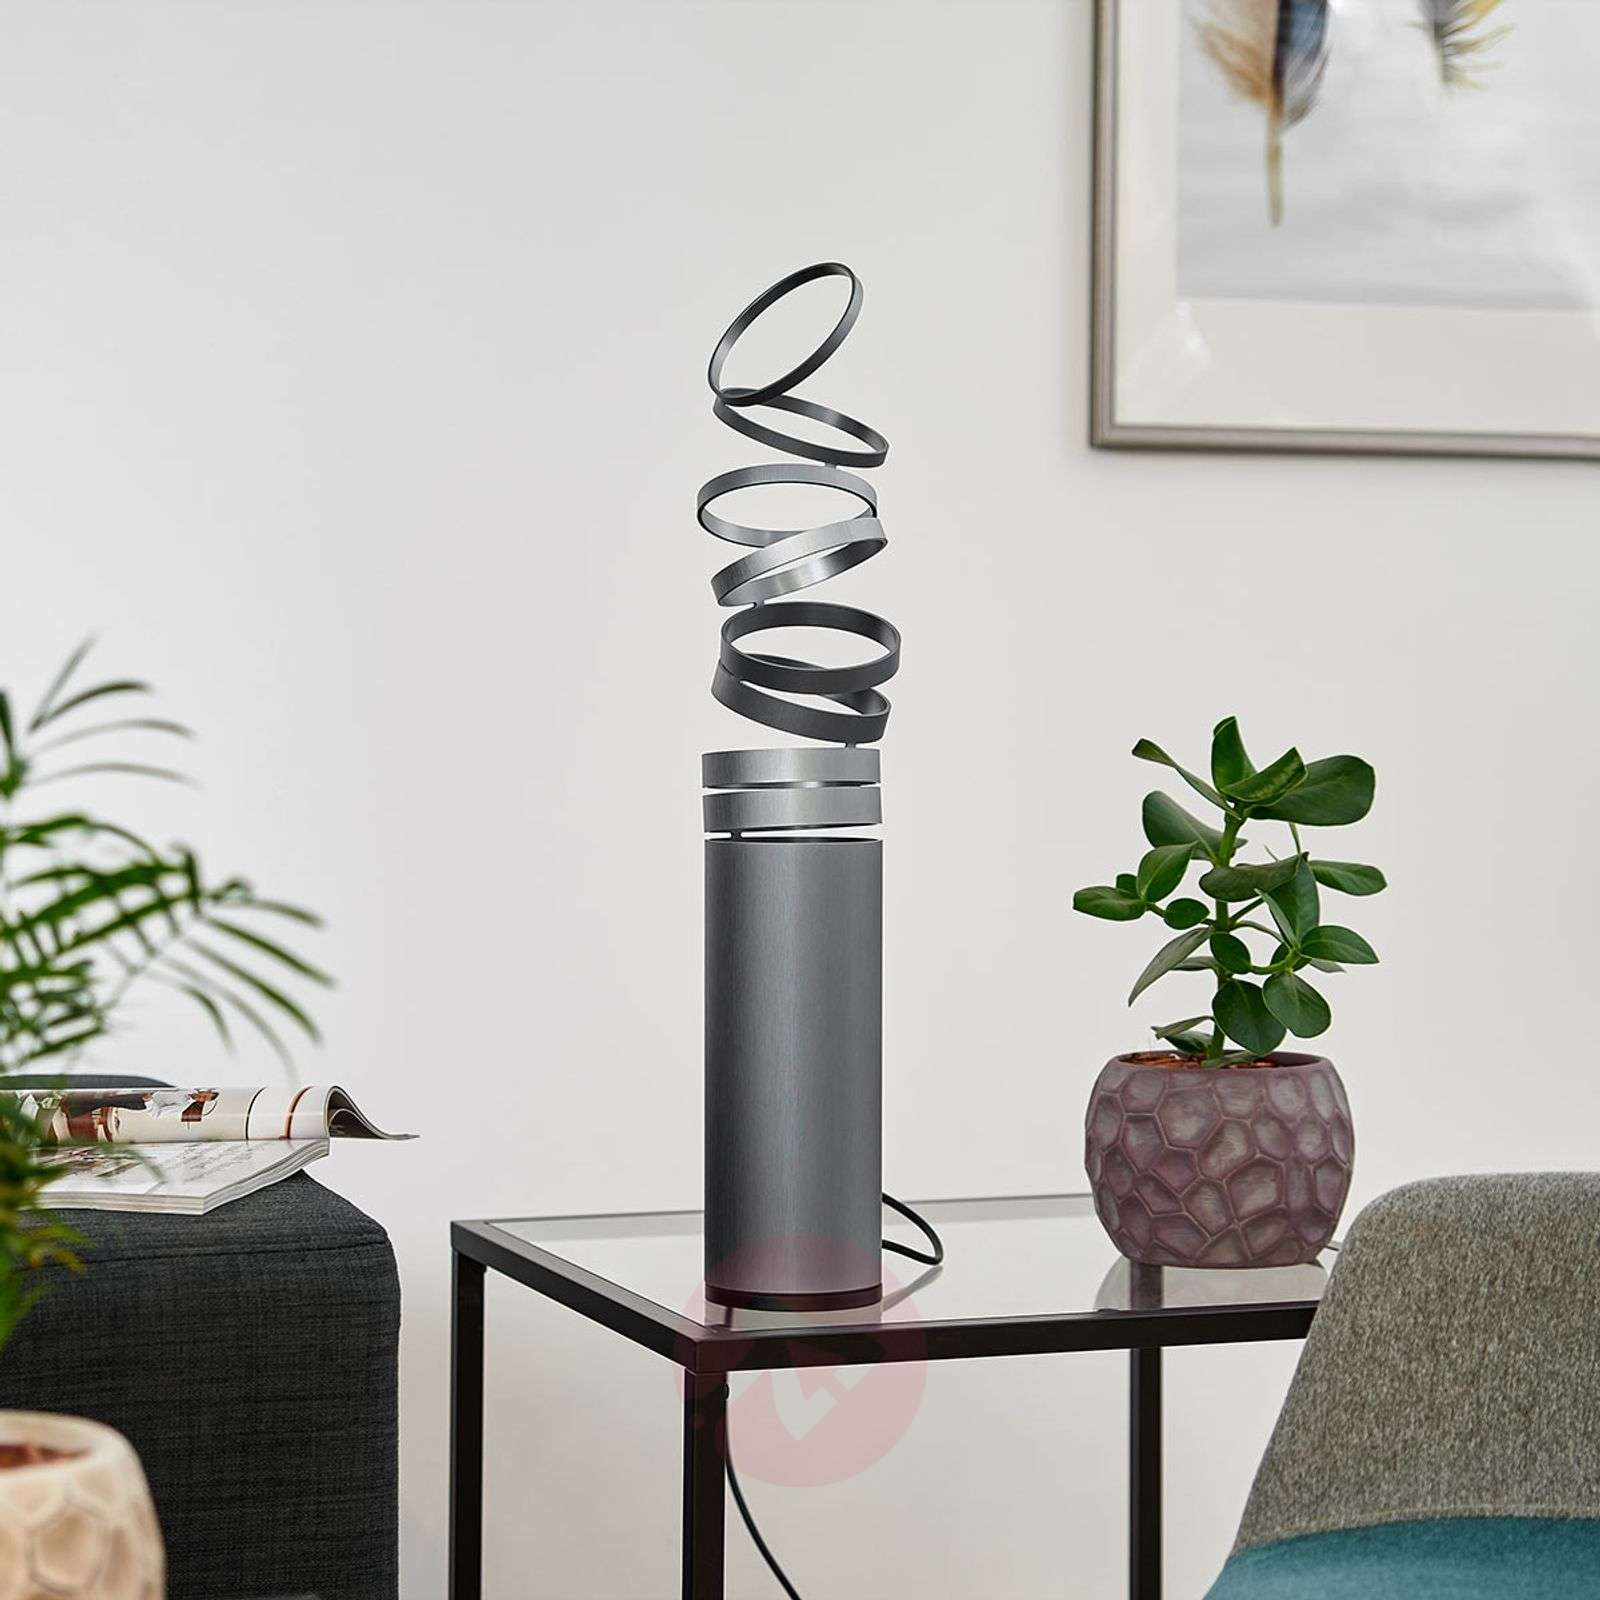 Decompose playful designer table lamp-1060059-01